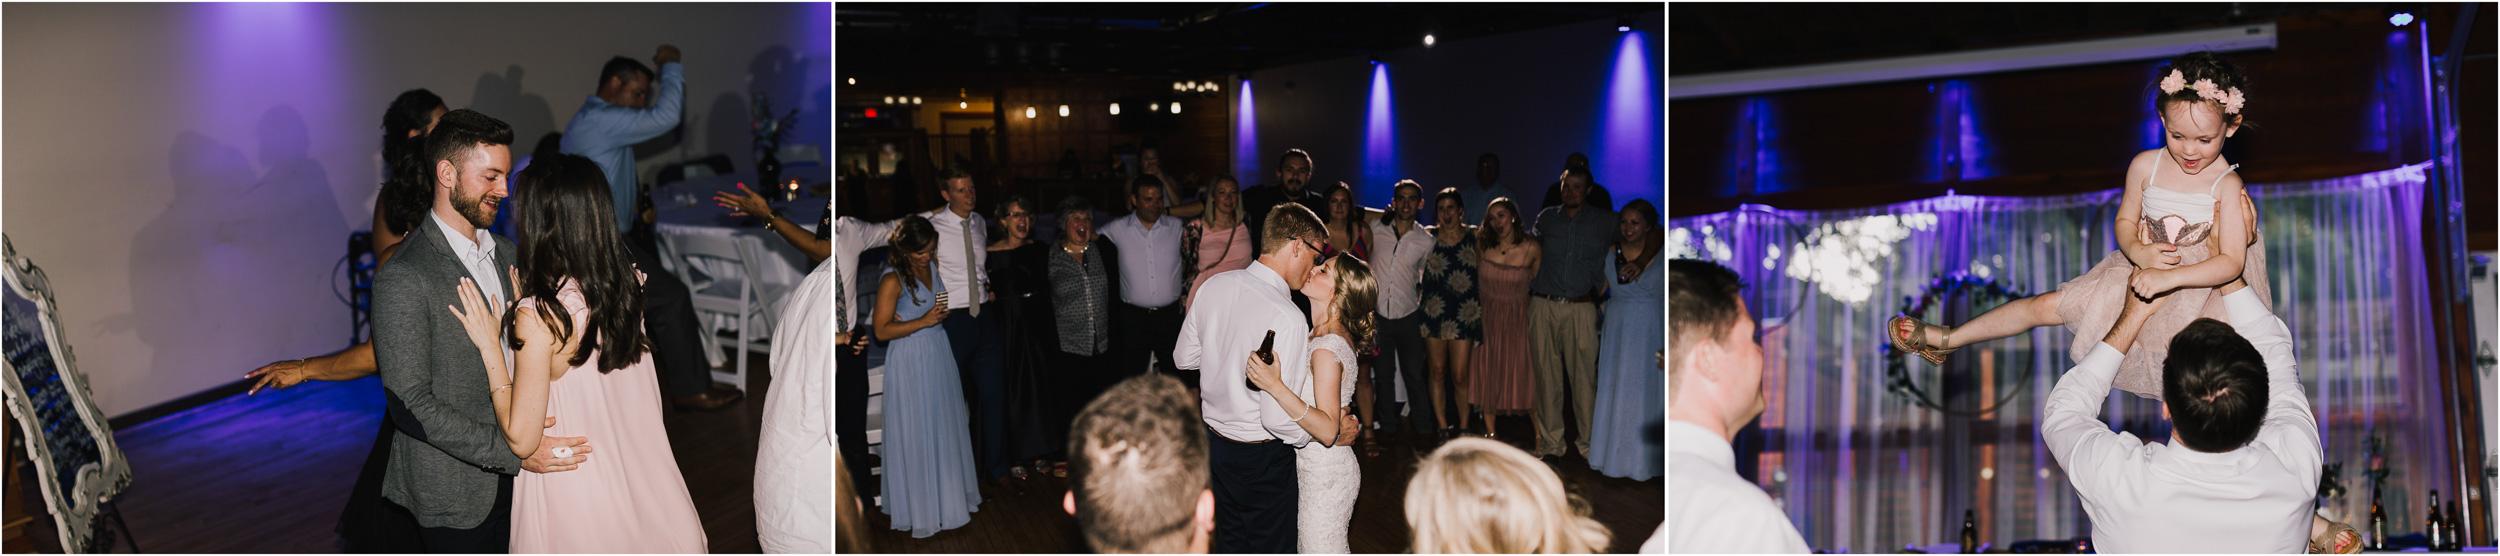 alyssa barletter photography classic kansas city summer wedding photographer dustin and erica king-71.jpg